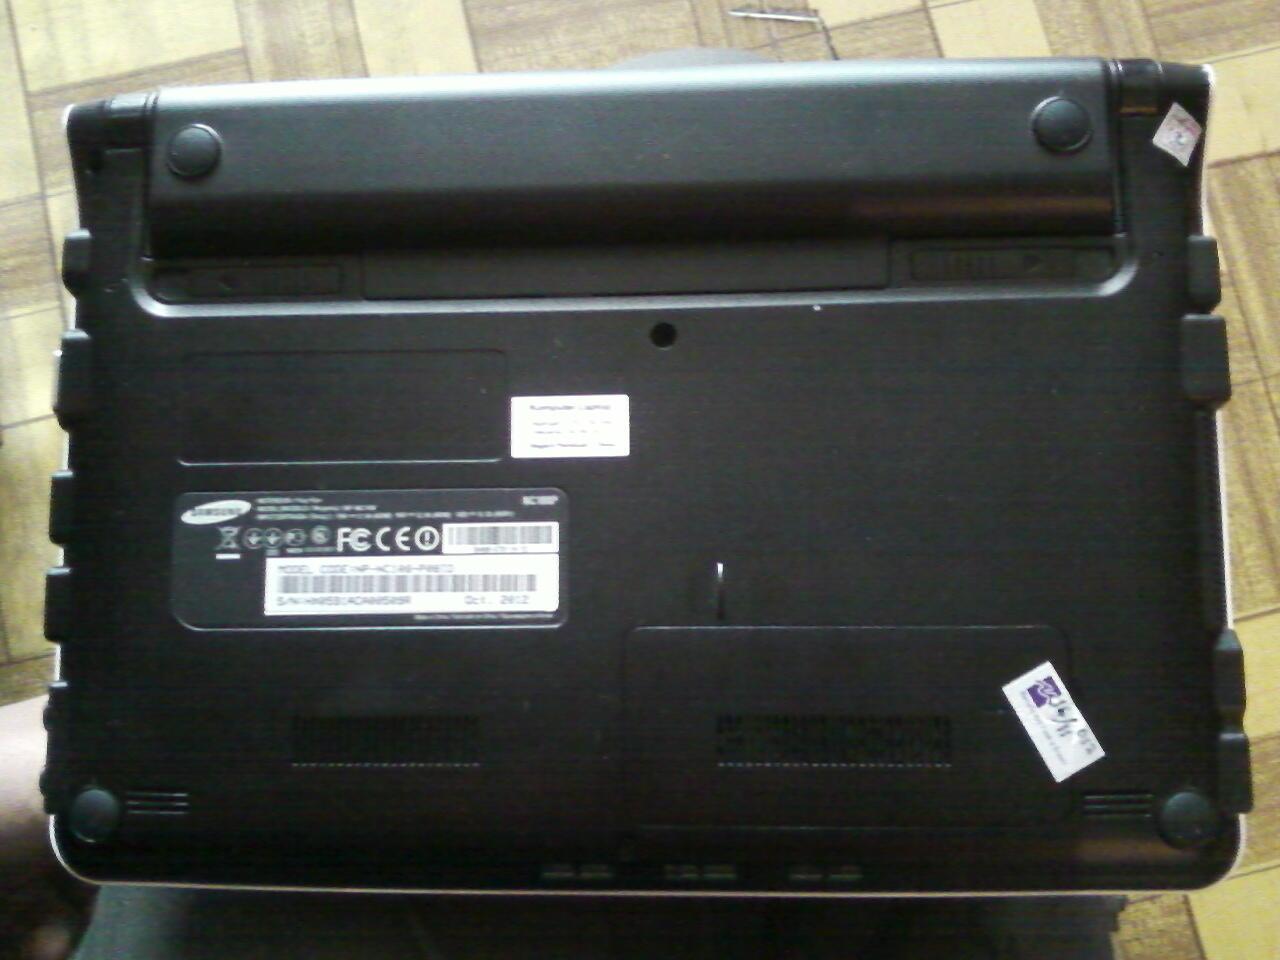 Netbook Samsung NC-108